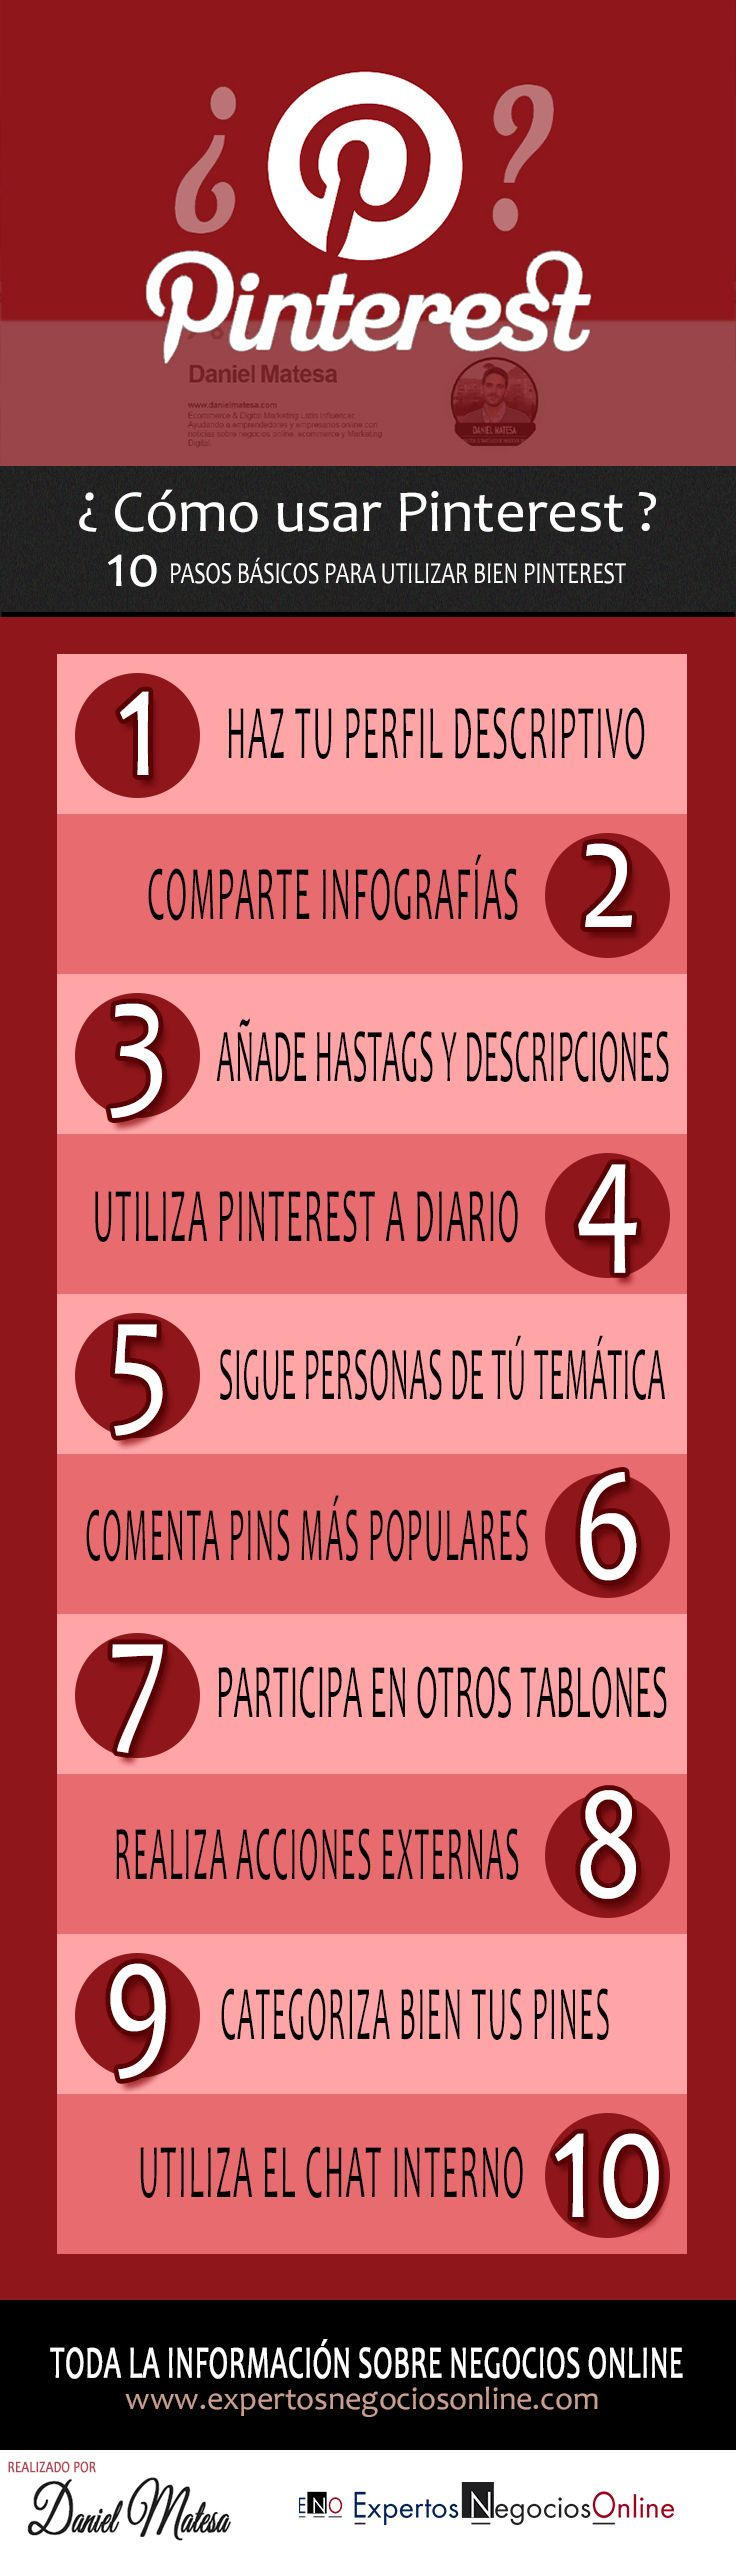 Infografía sobre Pinterest. Cómo usar Pinterest? Como funciona pinterest? Trucos y consejos para usar Pinterest #Pinterest #SocialMedia #RedesSociales